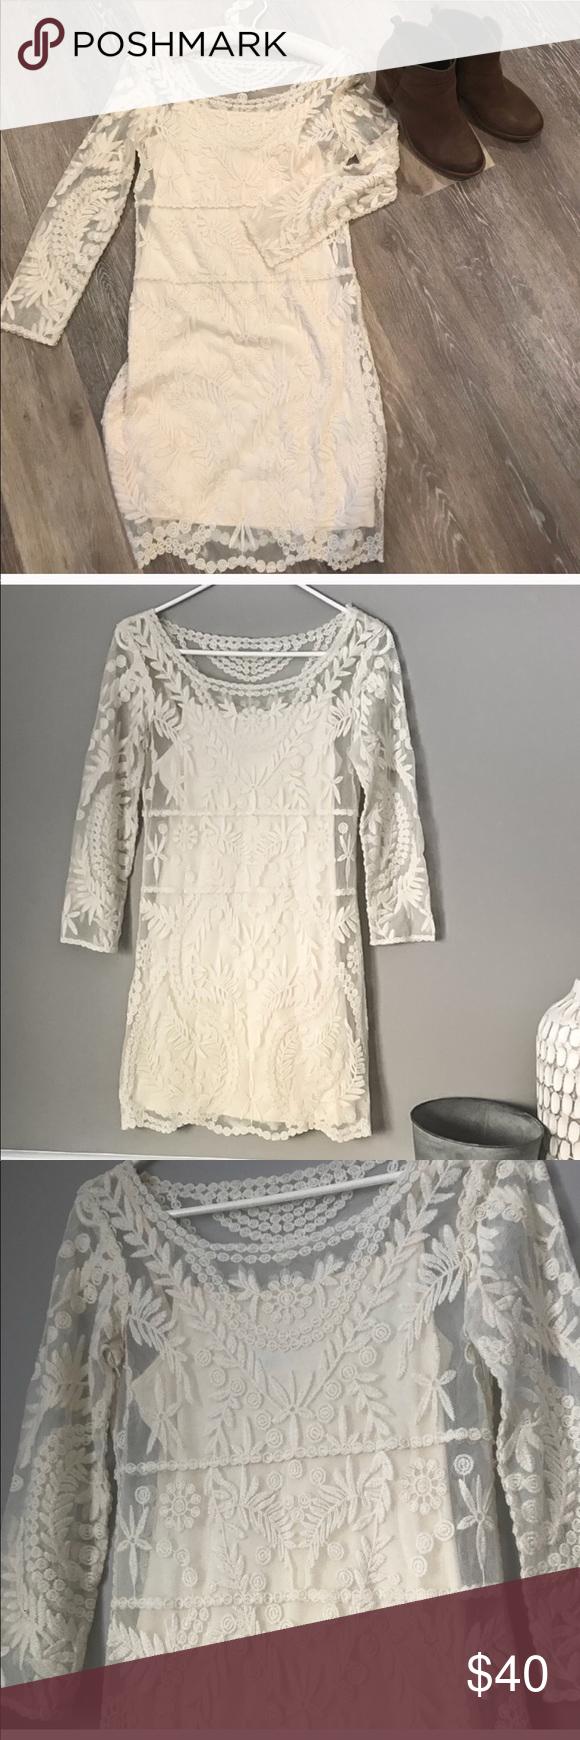 Express lace dress Express lace overlay dress. Dress has